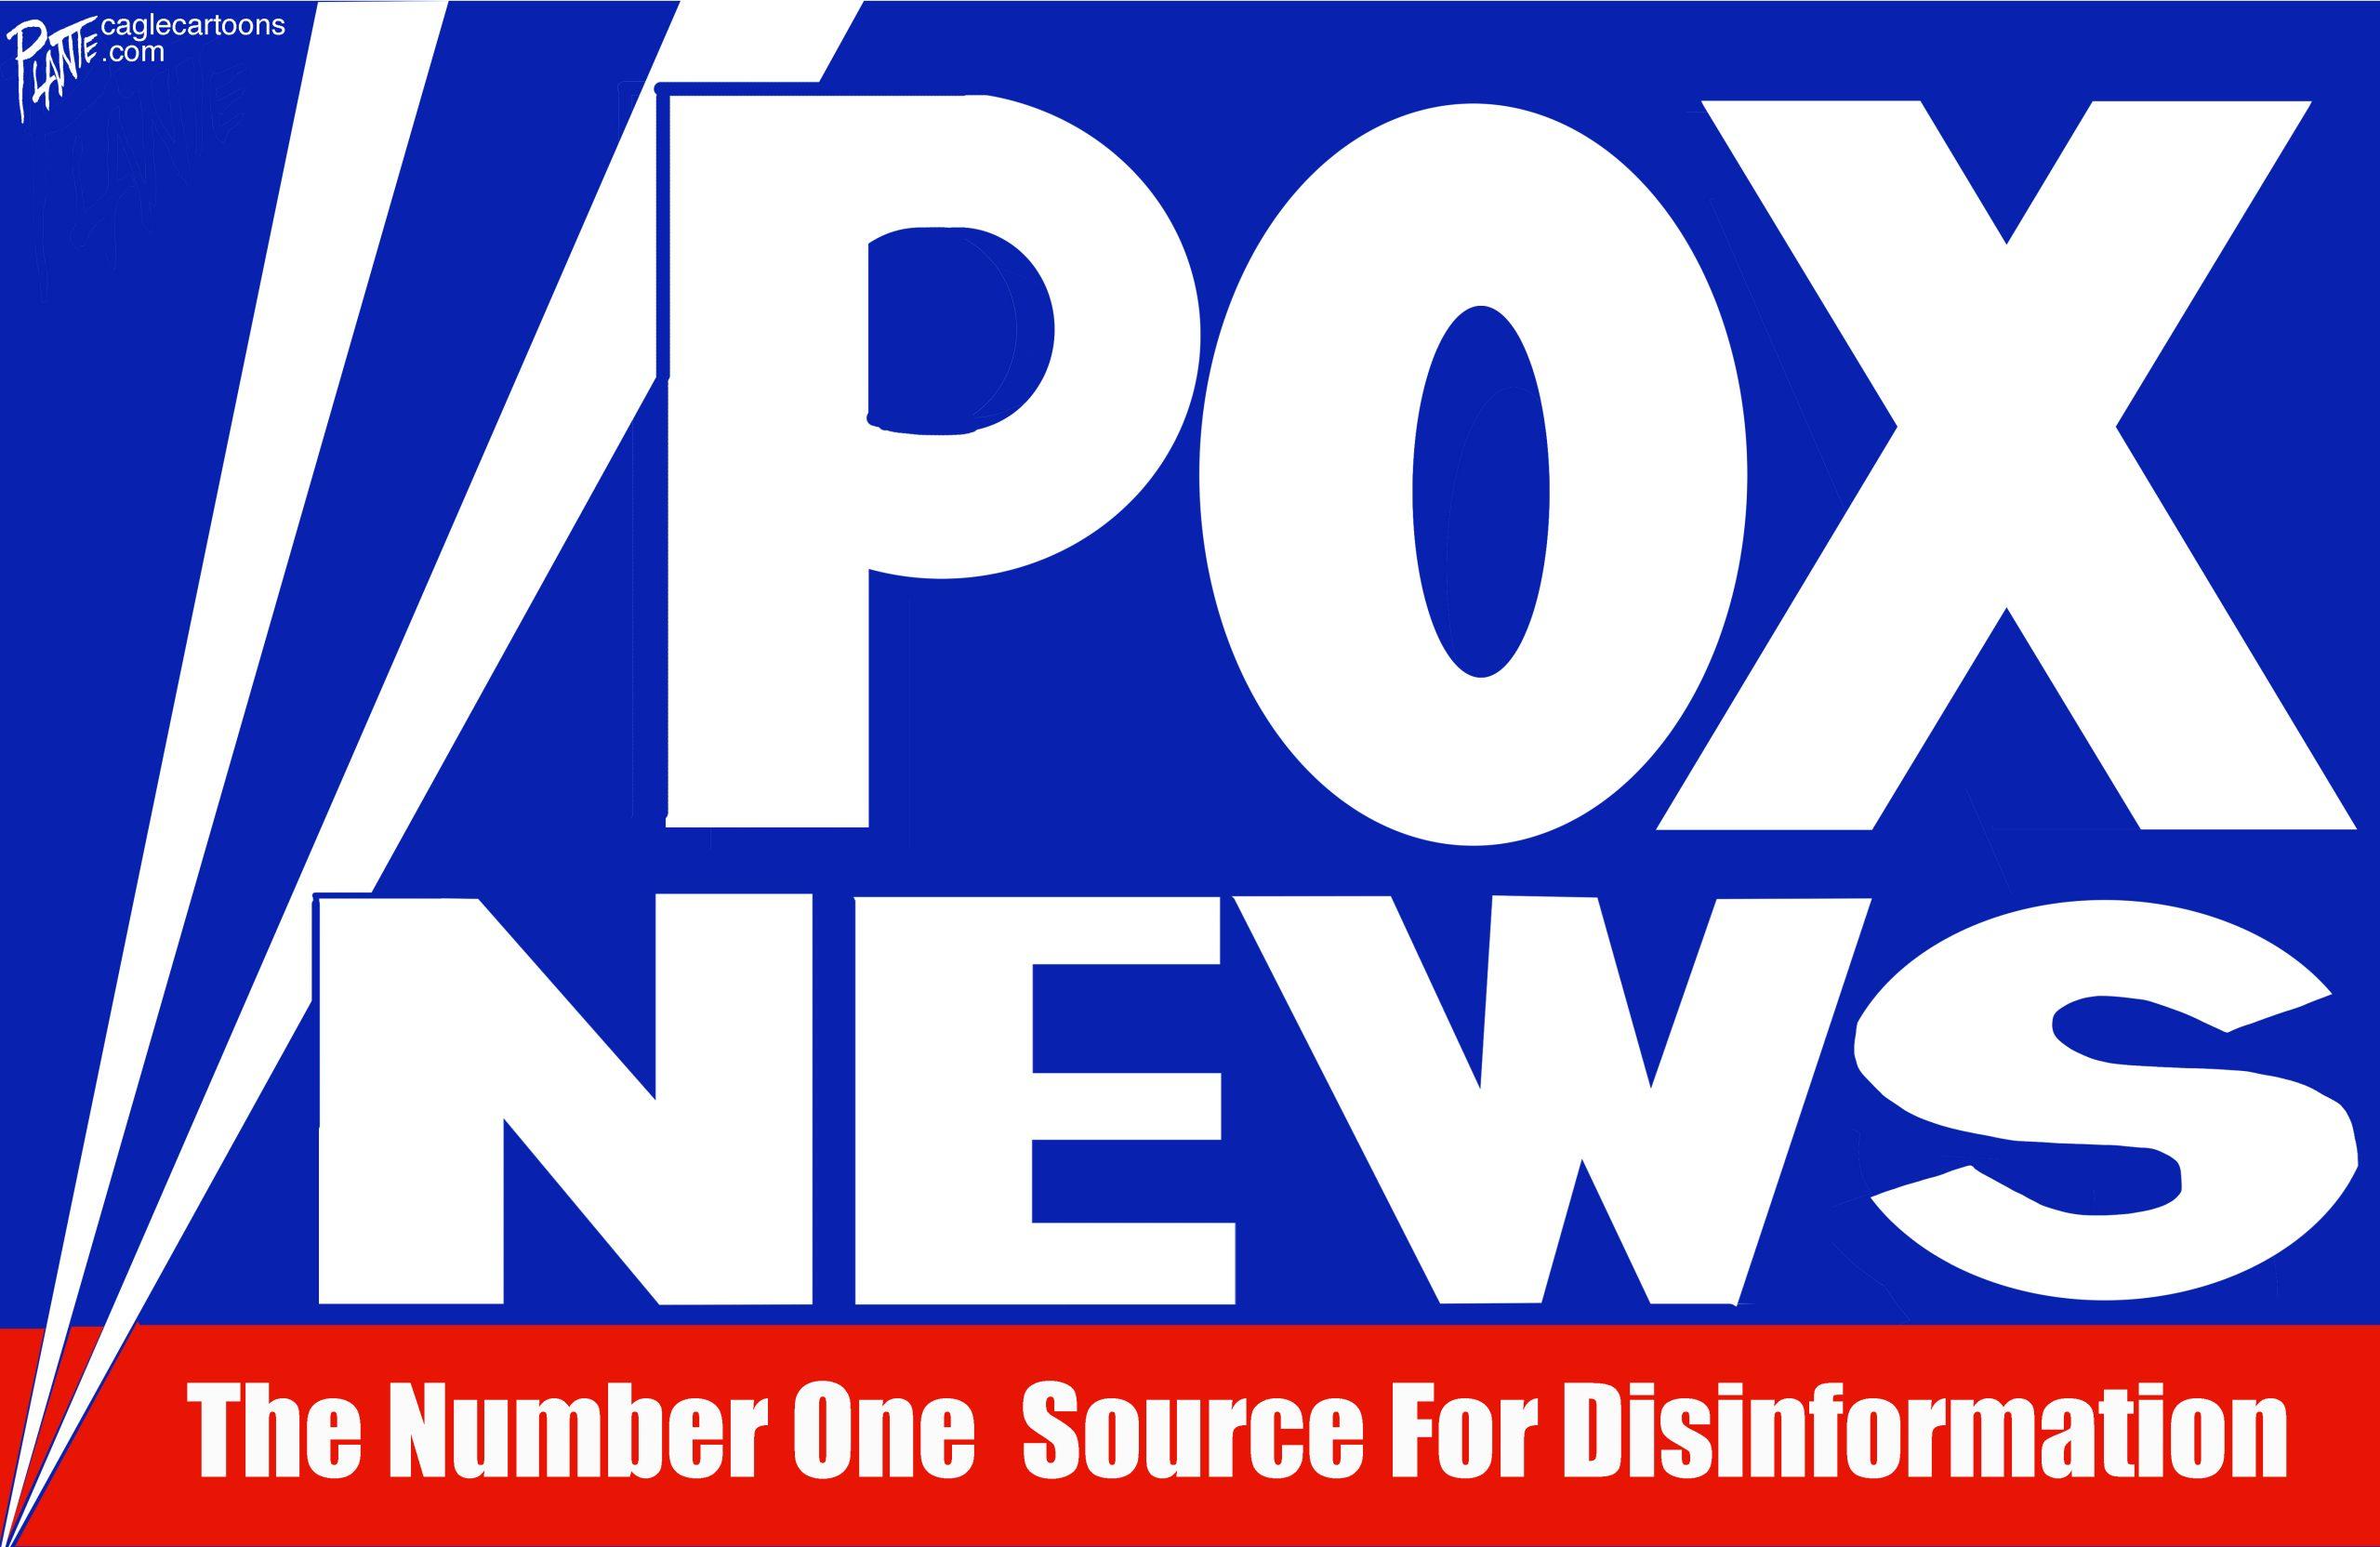 FOX News spreads COVID-19 disinformation. A pox on your house, Fox News, disinformation, pandemic, anti-vaccines, coronavirus, covid-19, delta variant, anti-vaxxer.